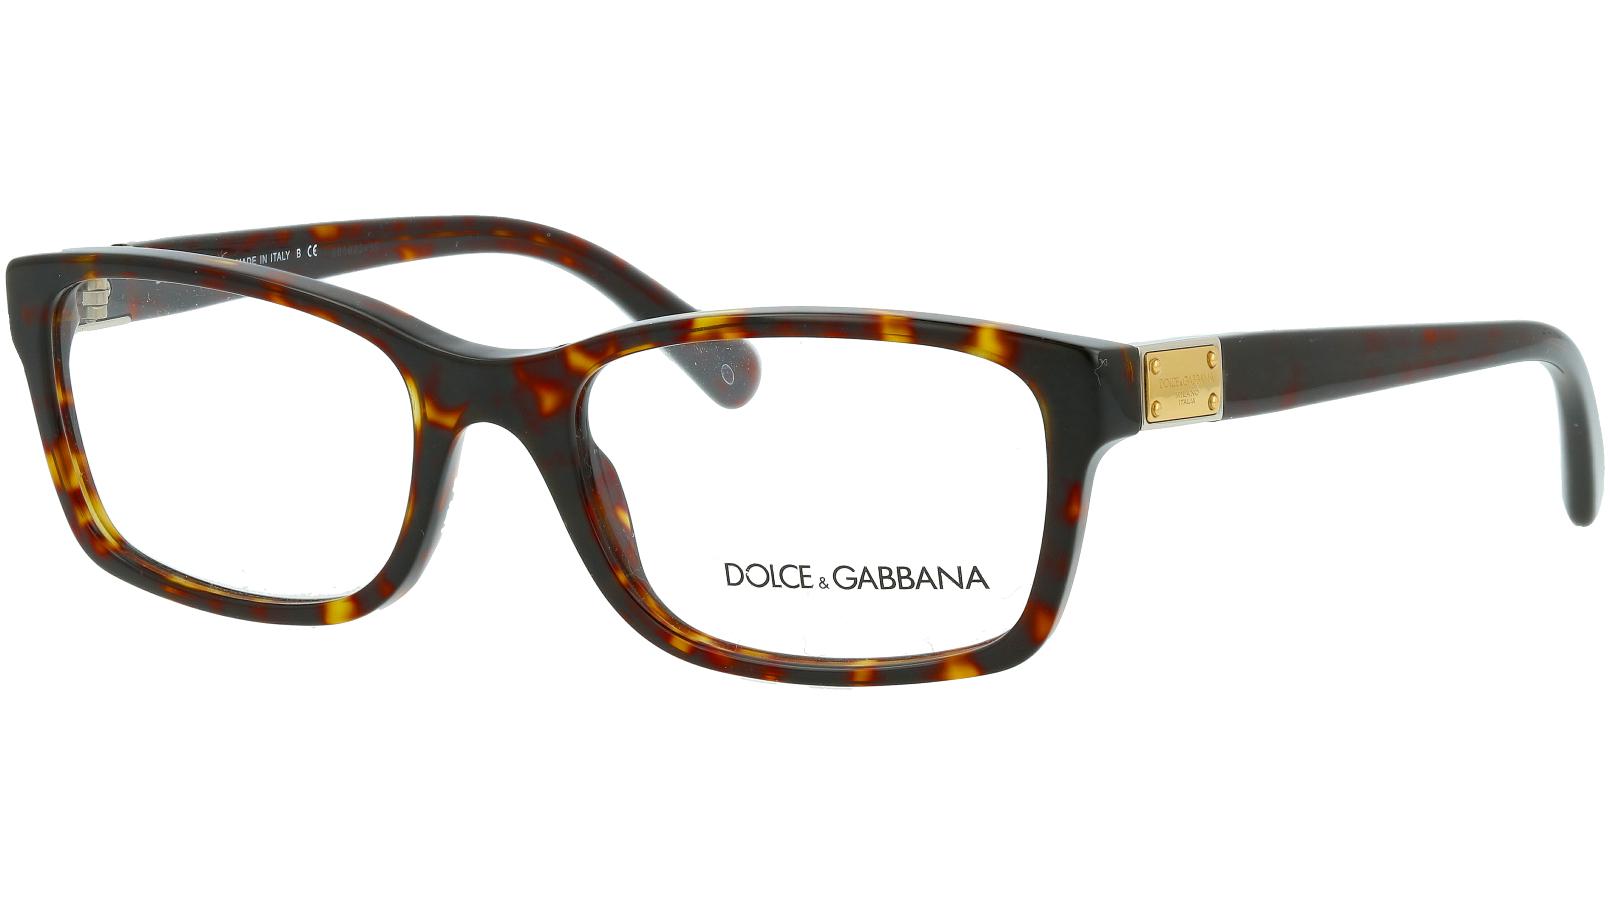 Dolce&Gabbana DG3170 502 53 HAVANA Glasses